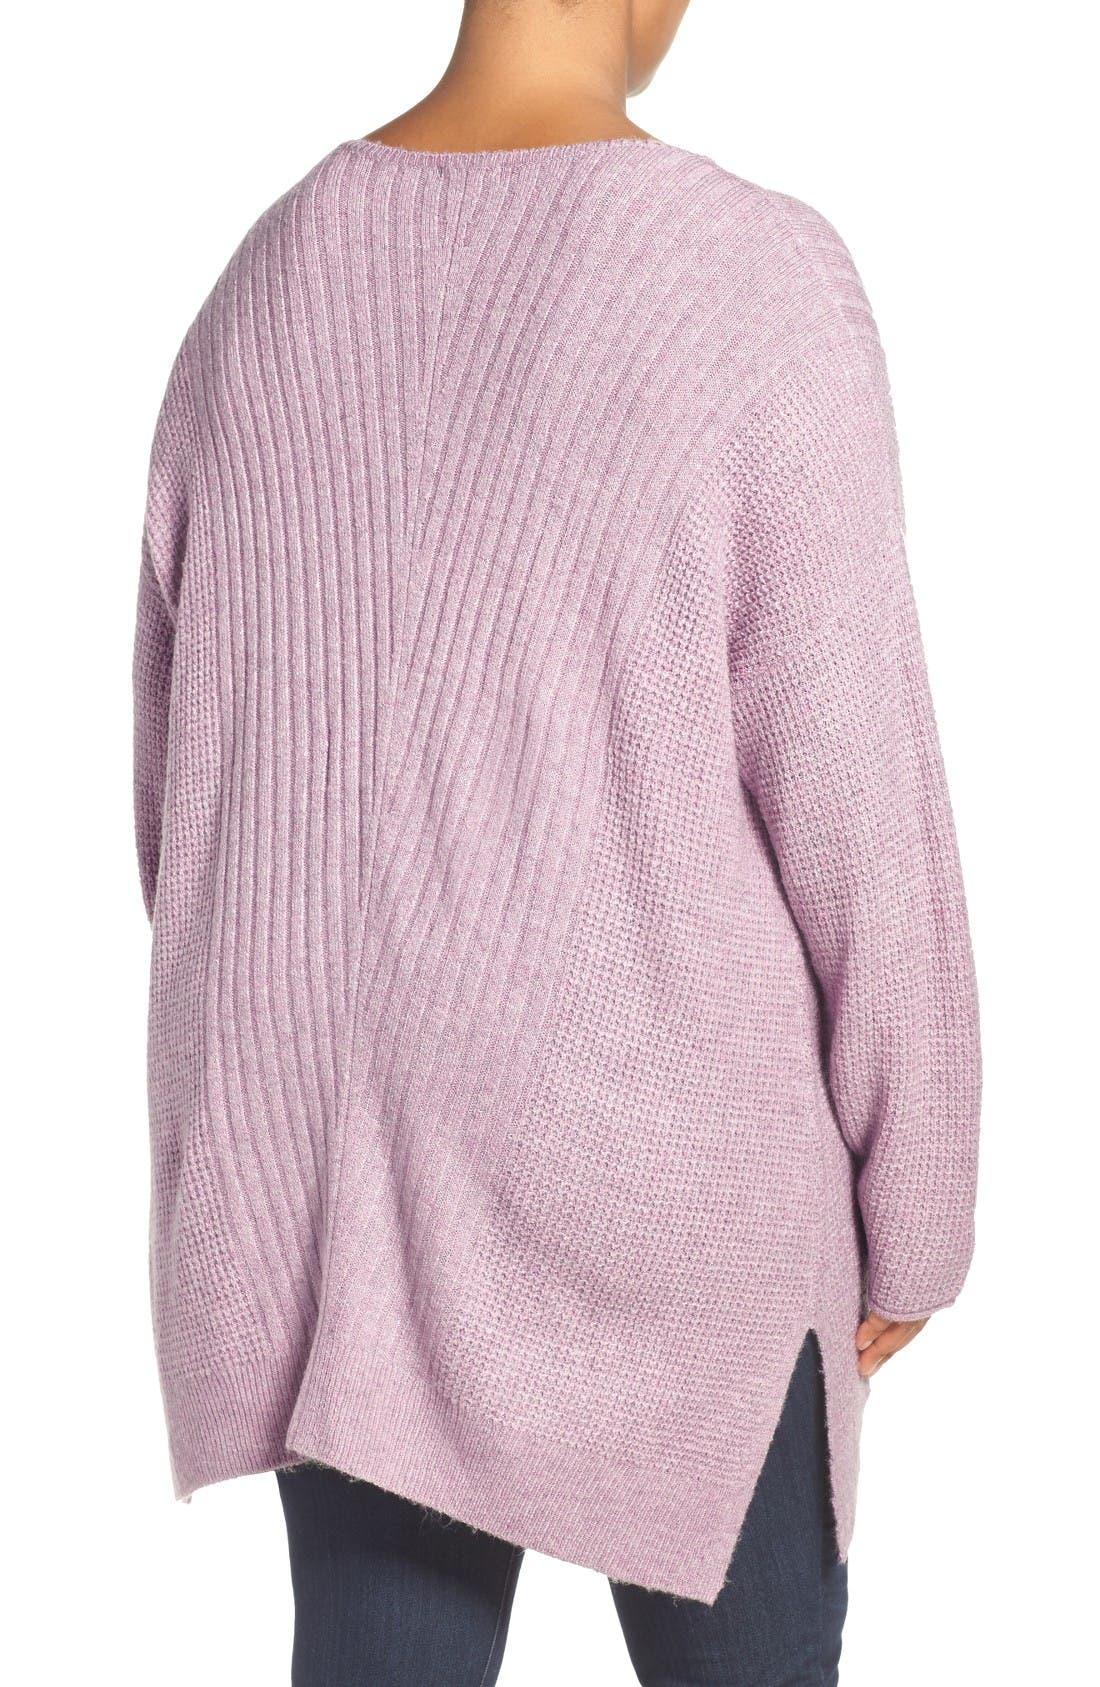 Mixed Stitch V-Neck Tunic Sweater,                             Alternate thumbnail 3, color,                             Heather Purple Morn